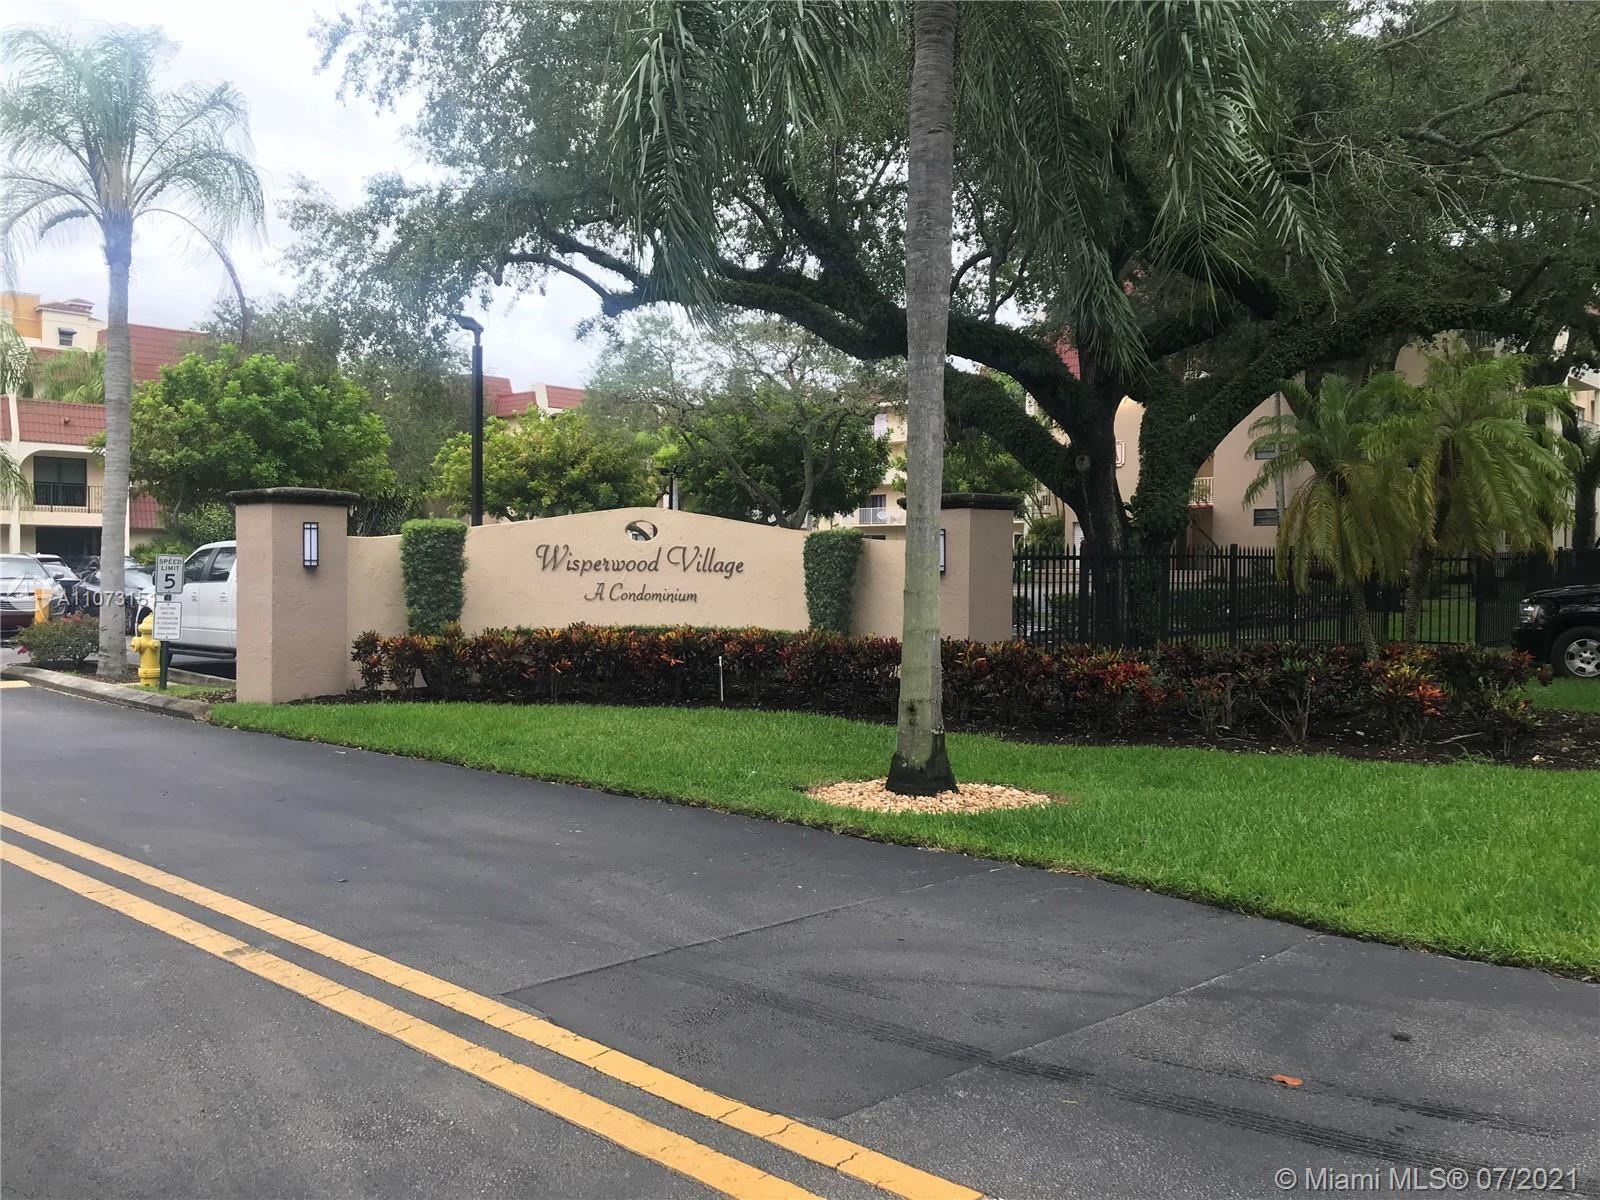 9301 SW 92nd Ave #C105, Miami, FL 33176 - #: A11073151